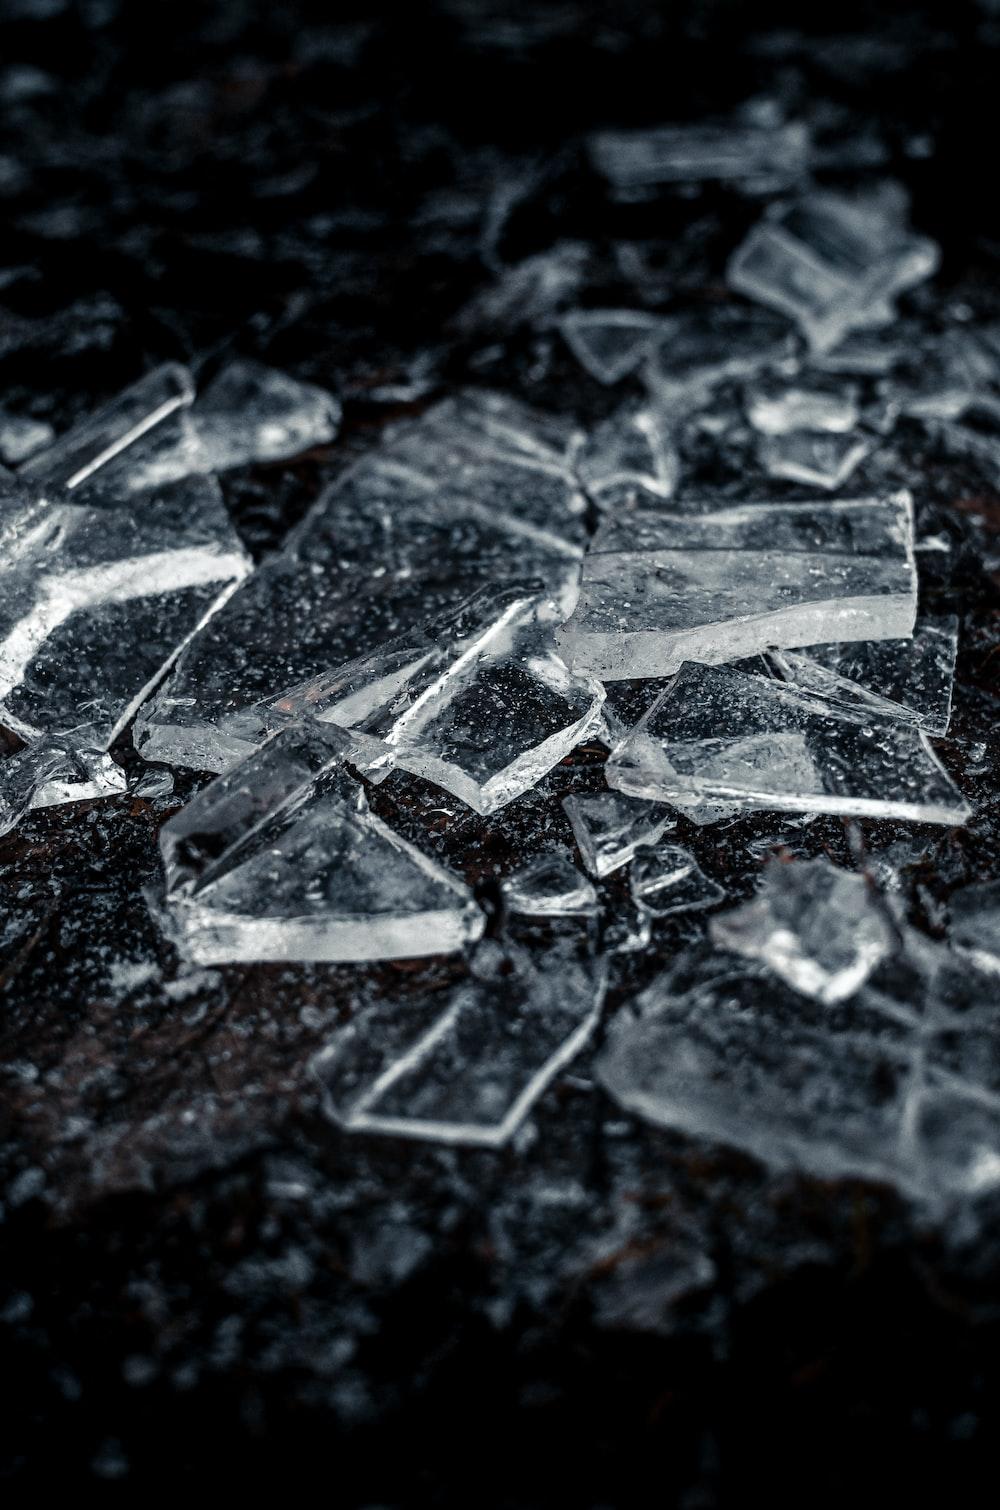 broken glass on black surface